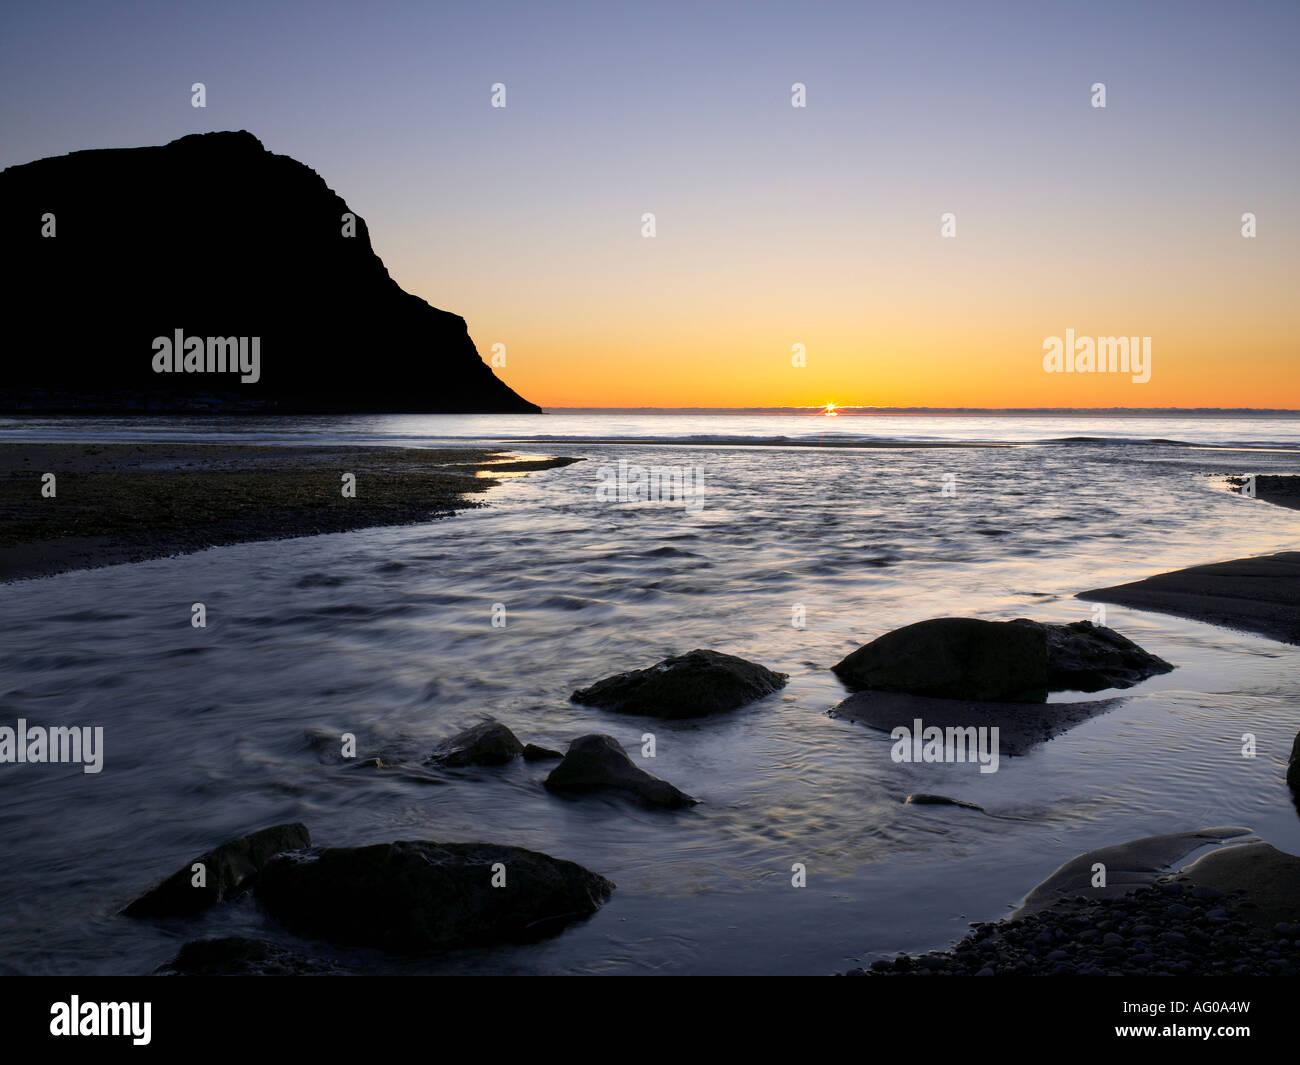 Midnight sun on black sand beach, Mt Ernir,  Bolungavik, West Fjords, Iceland - Stock Image